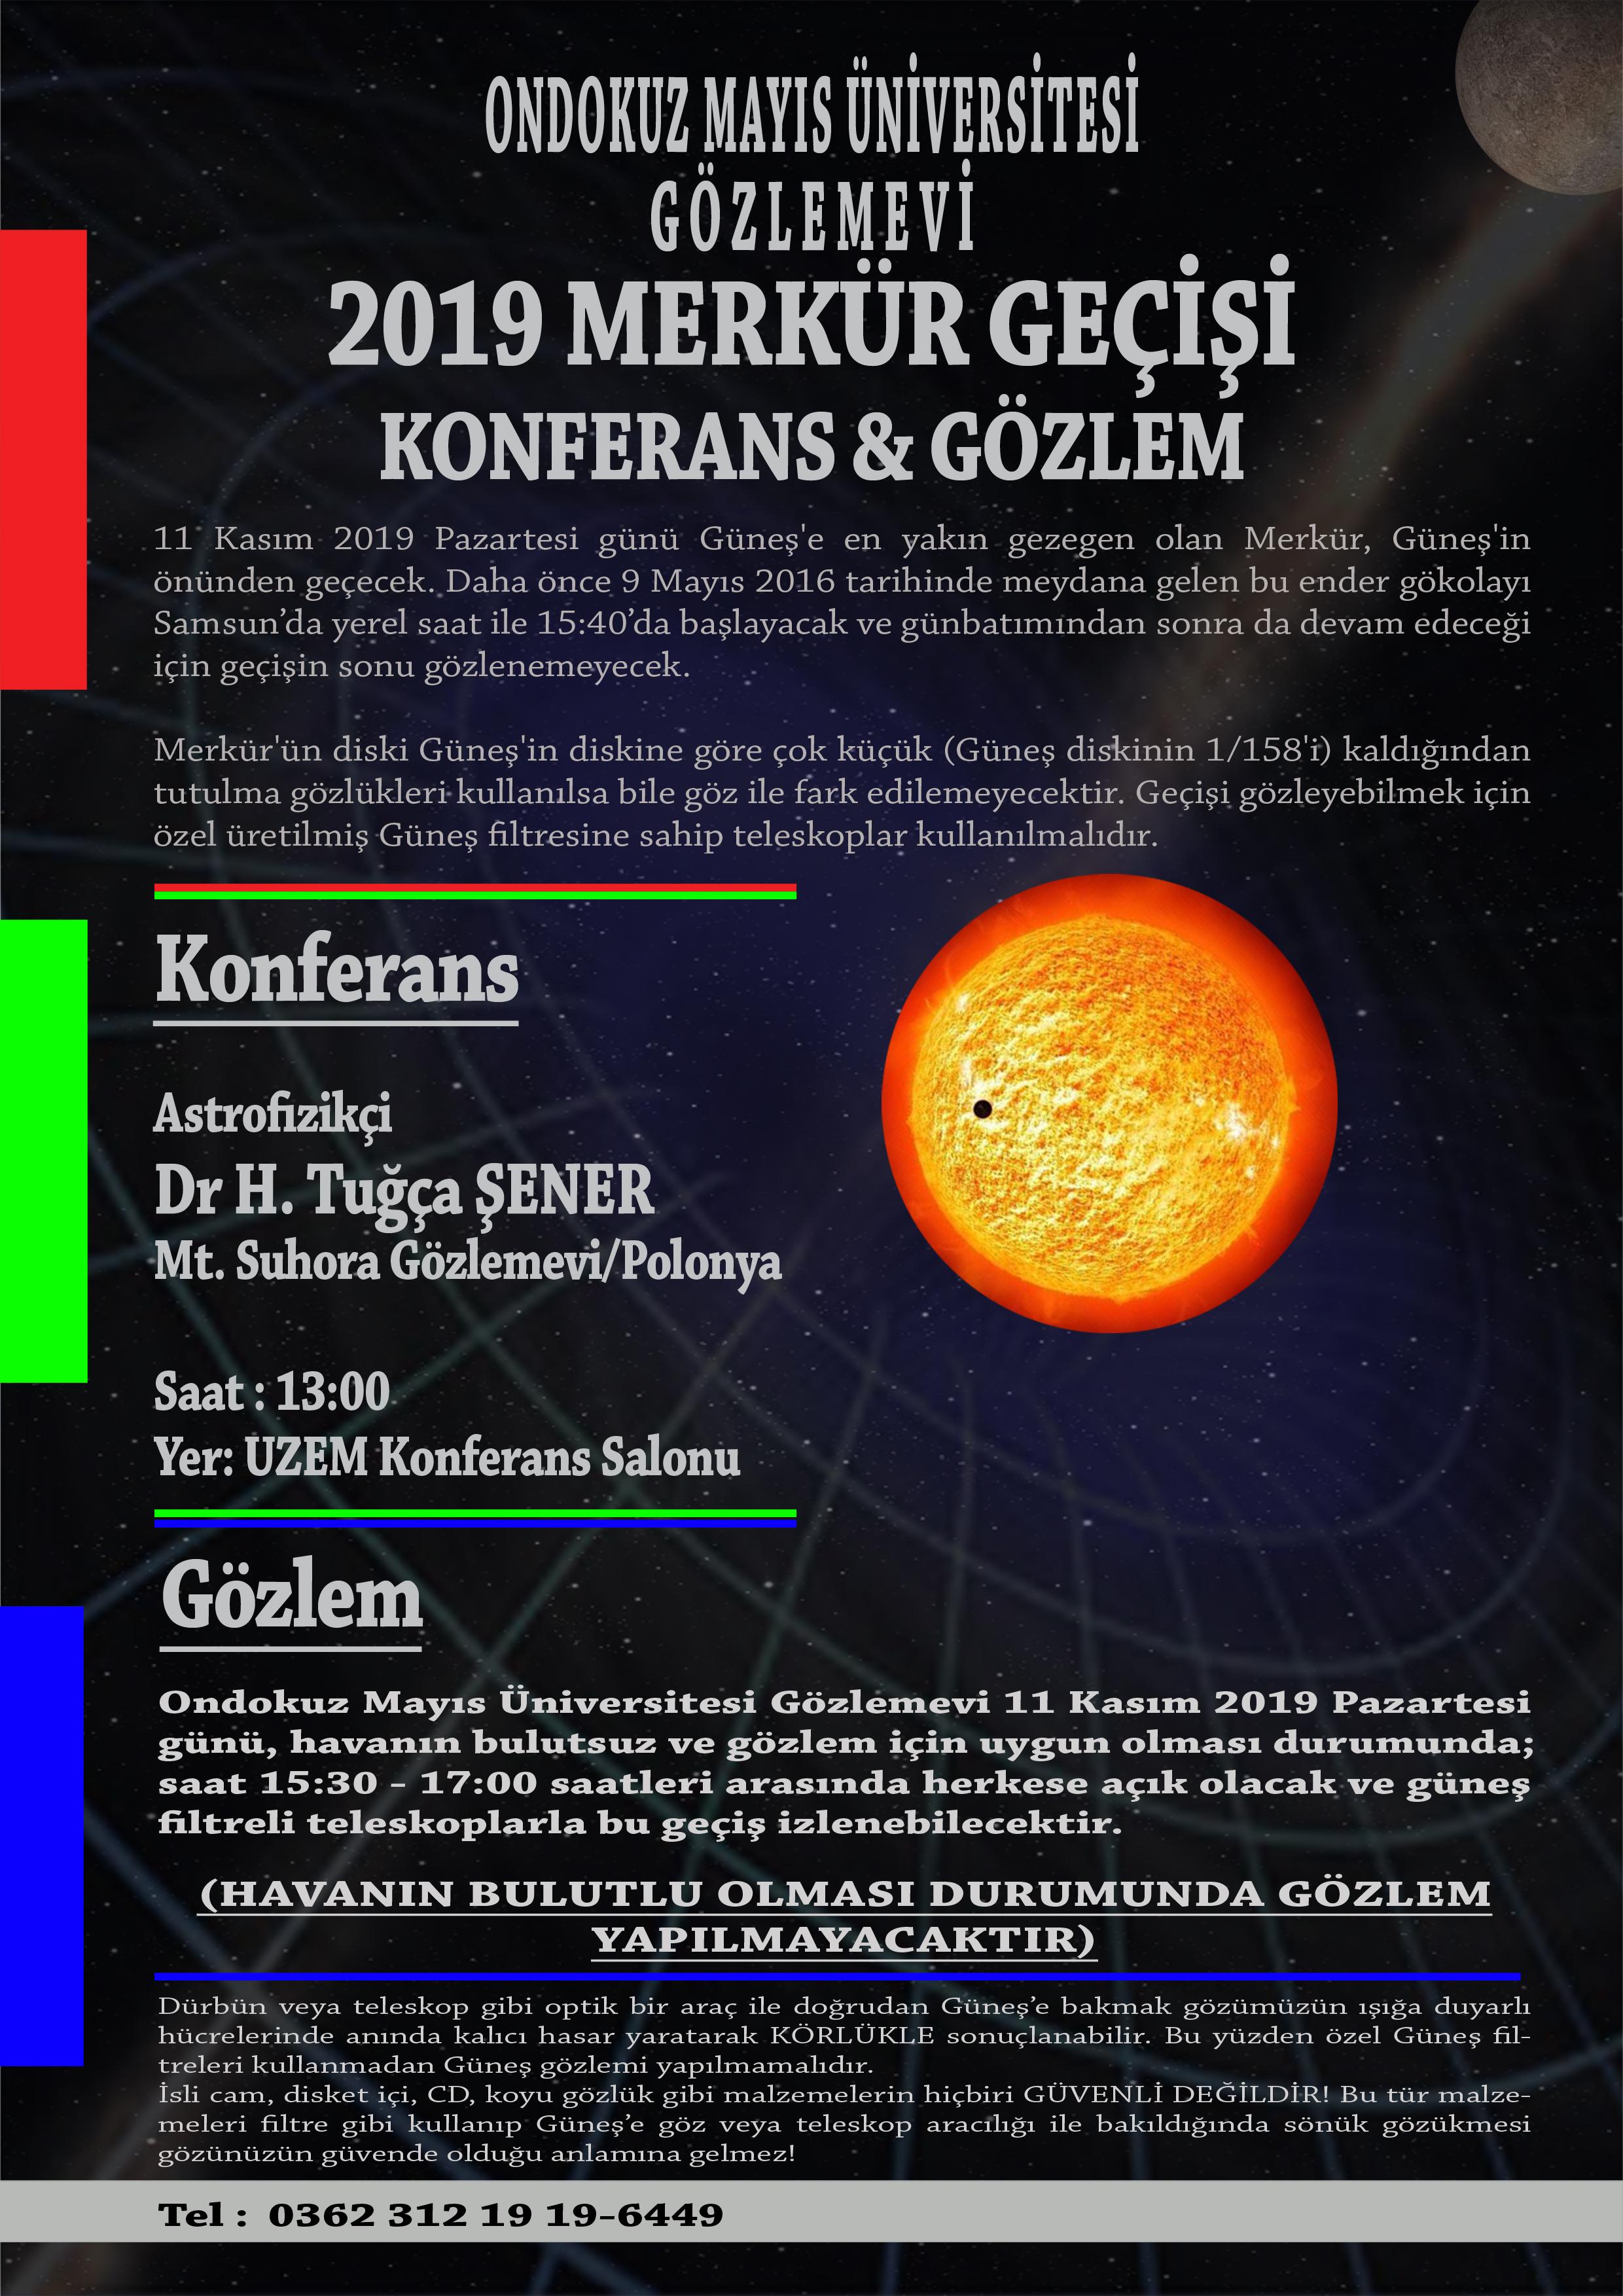 https://www.omu.edu.tr/sites/default/files/-merkur_gecisi.jpg